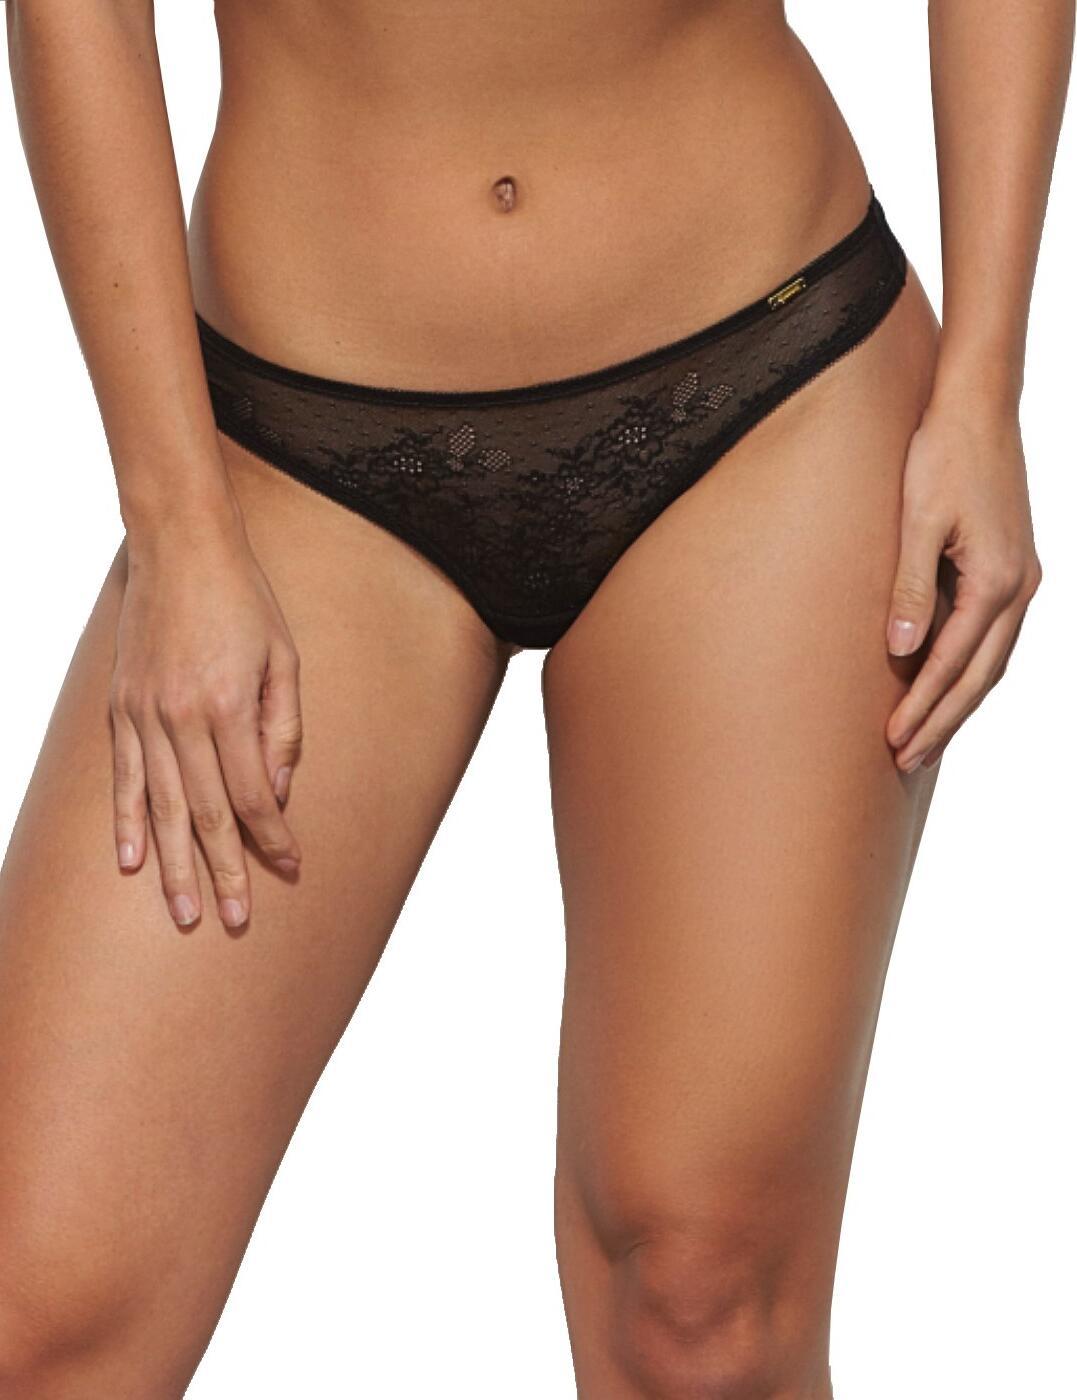 13006 Gossard Glossies Lace Thong - 13006 Black